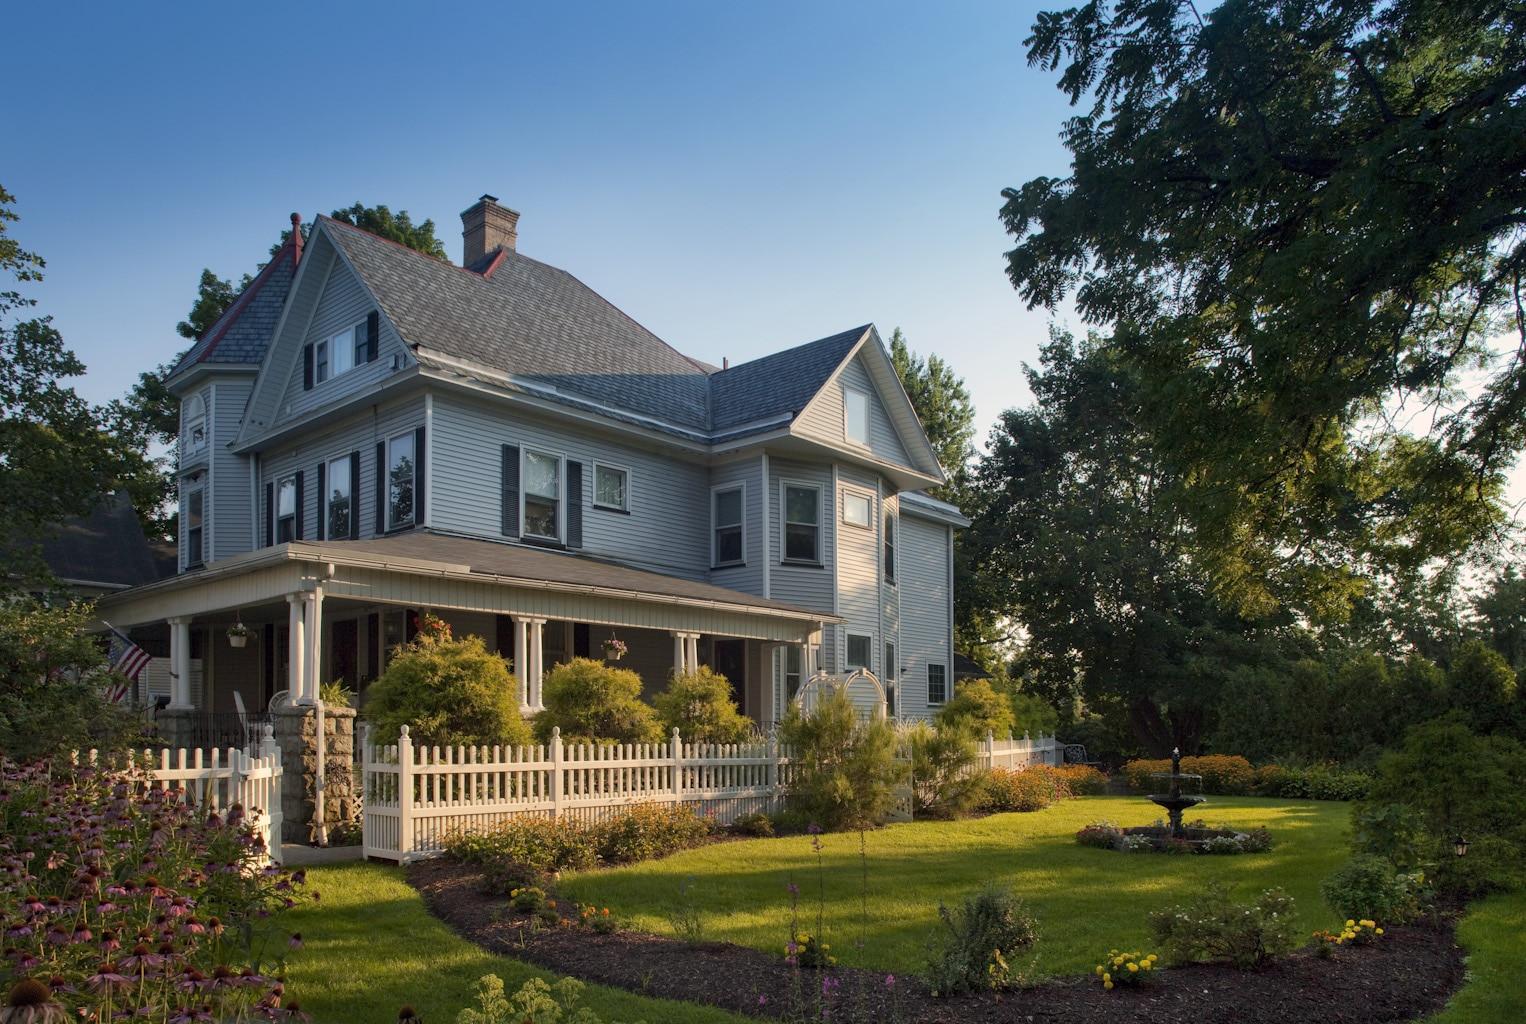 Whistling Swan Inn in Stanhope, New Jersey